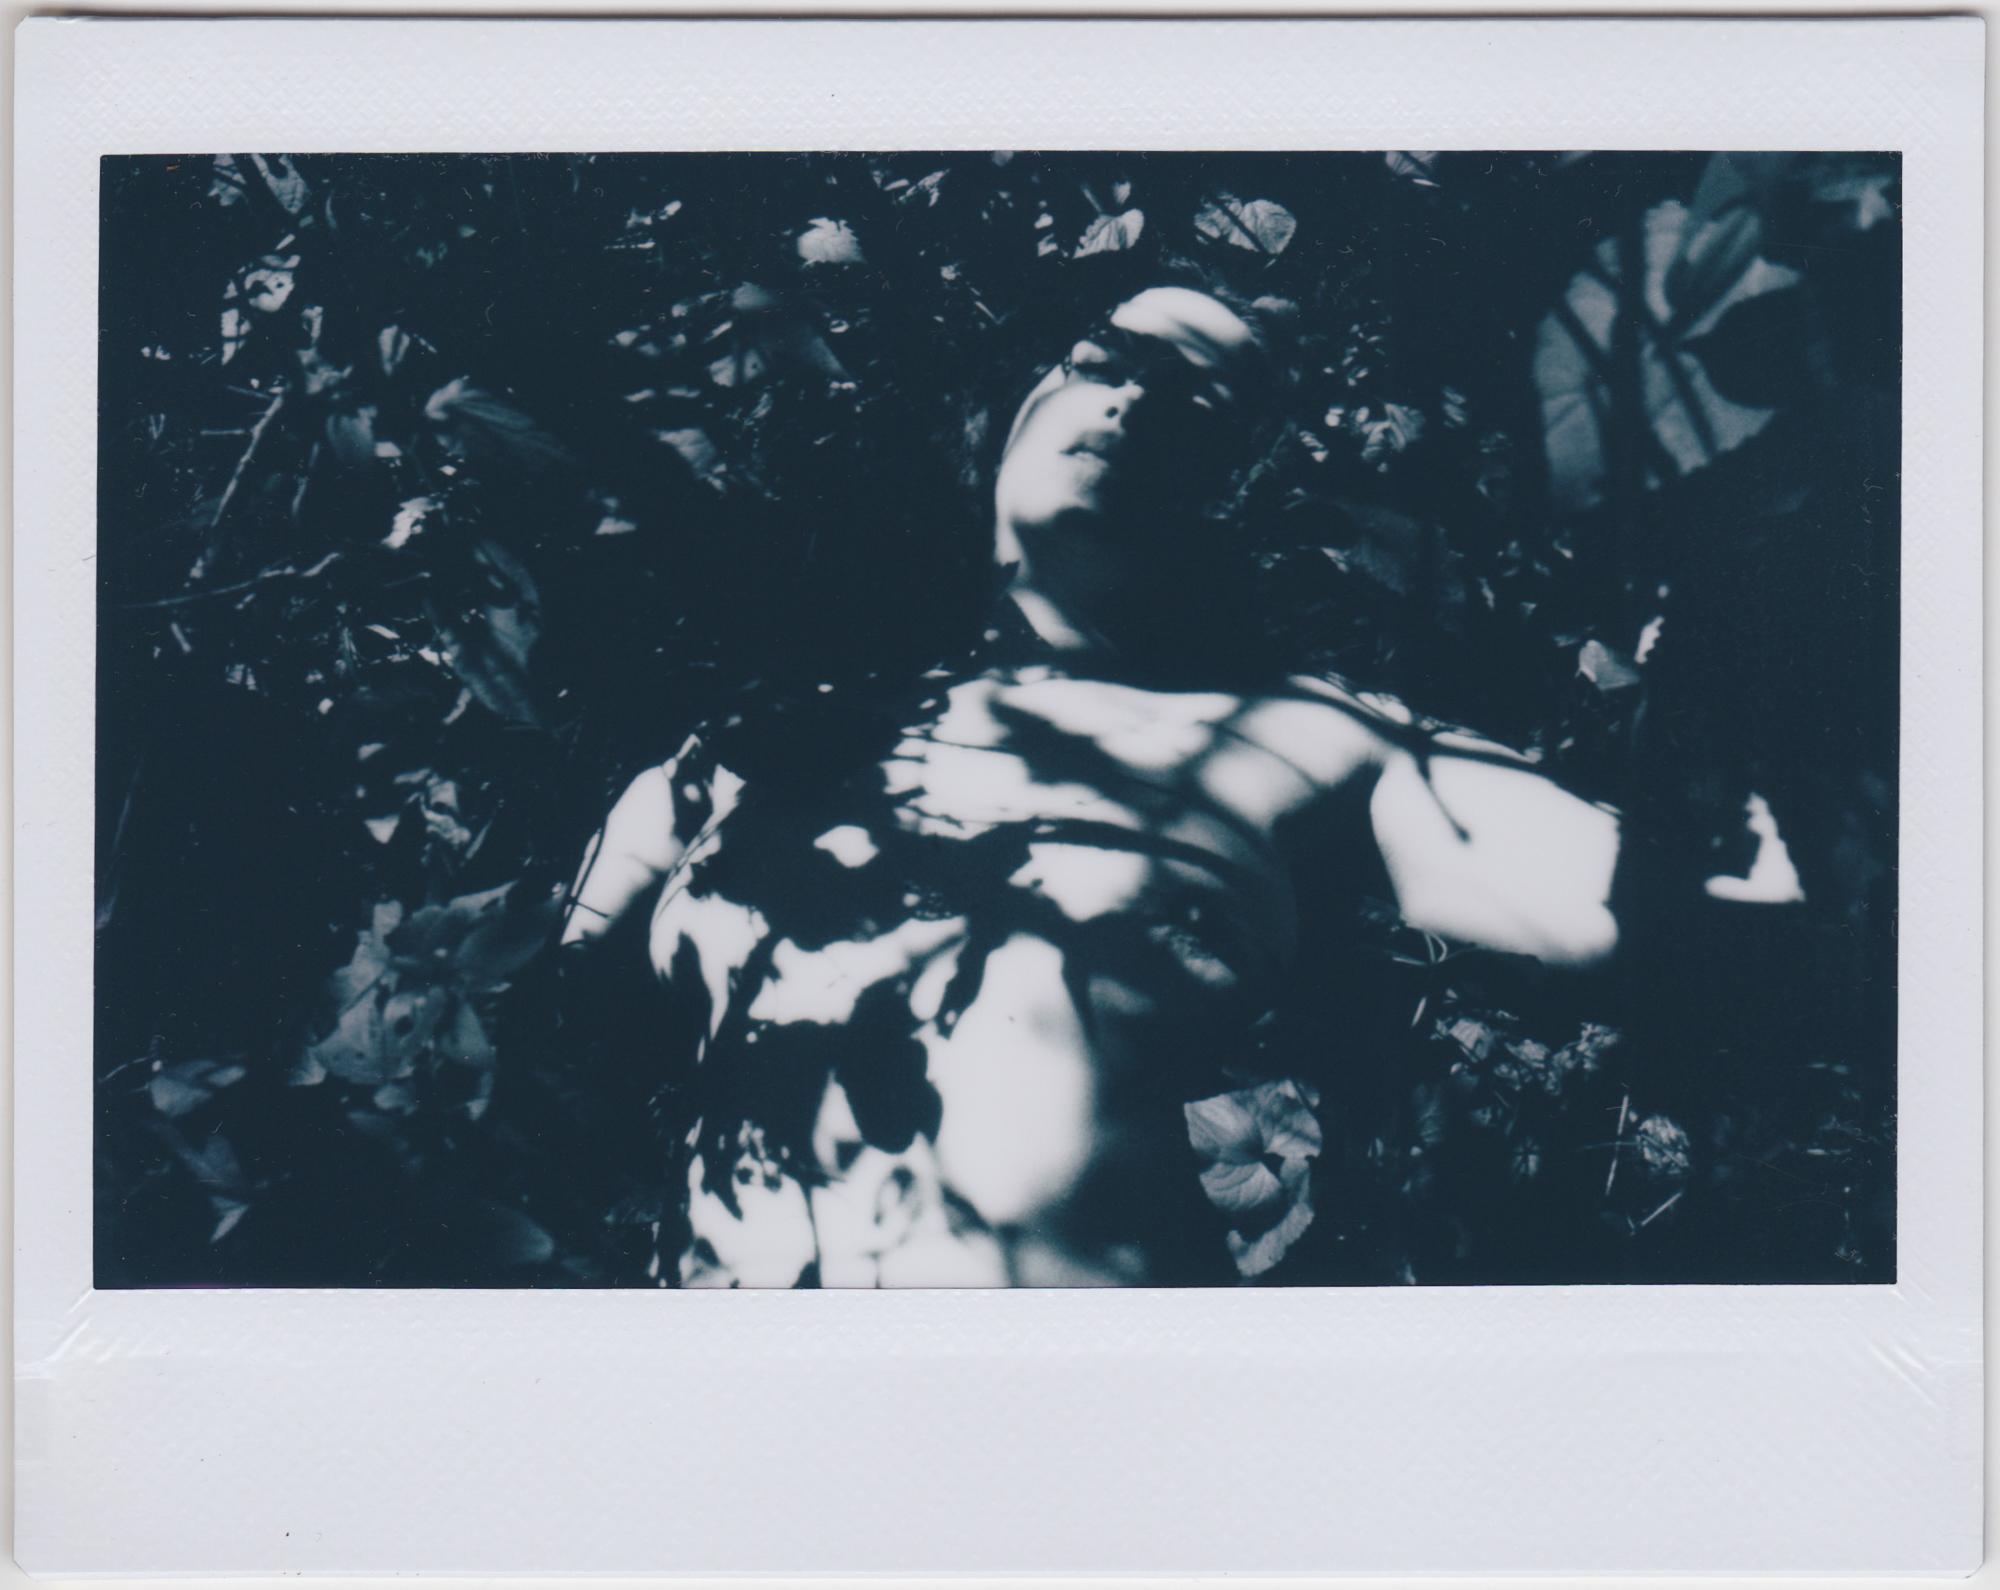 20190825-Hannah-woods-Instax-0002.jpg